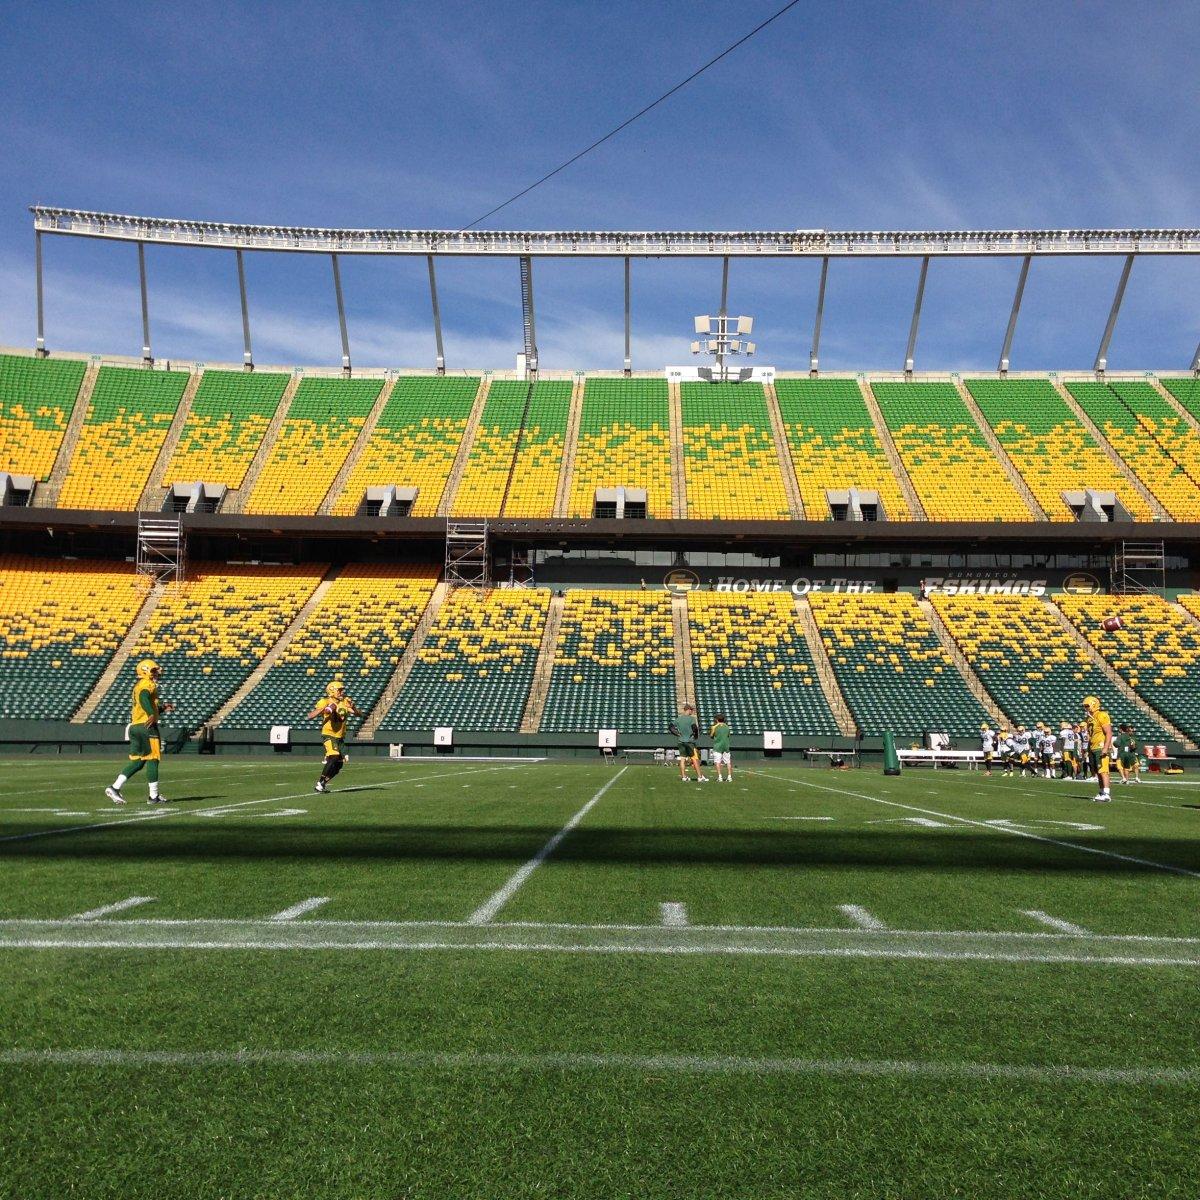 The Edmonton Eskimos practice at Commonwealth Stadium in preparation for their final pre-season game, Tuesday, June 14, 2016.